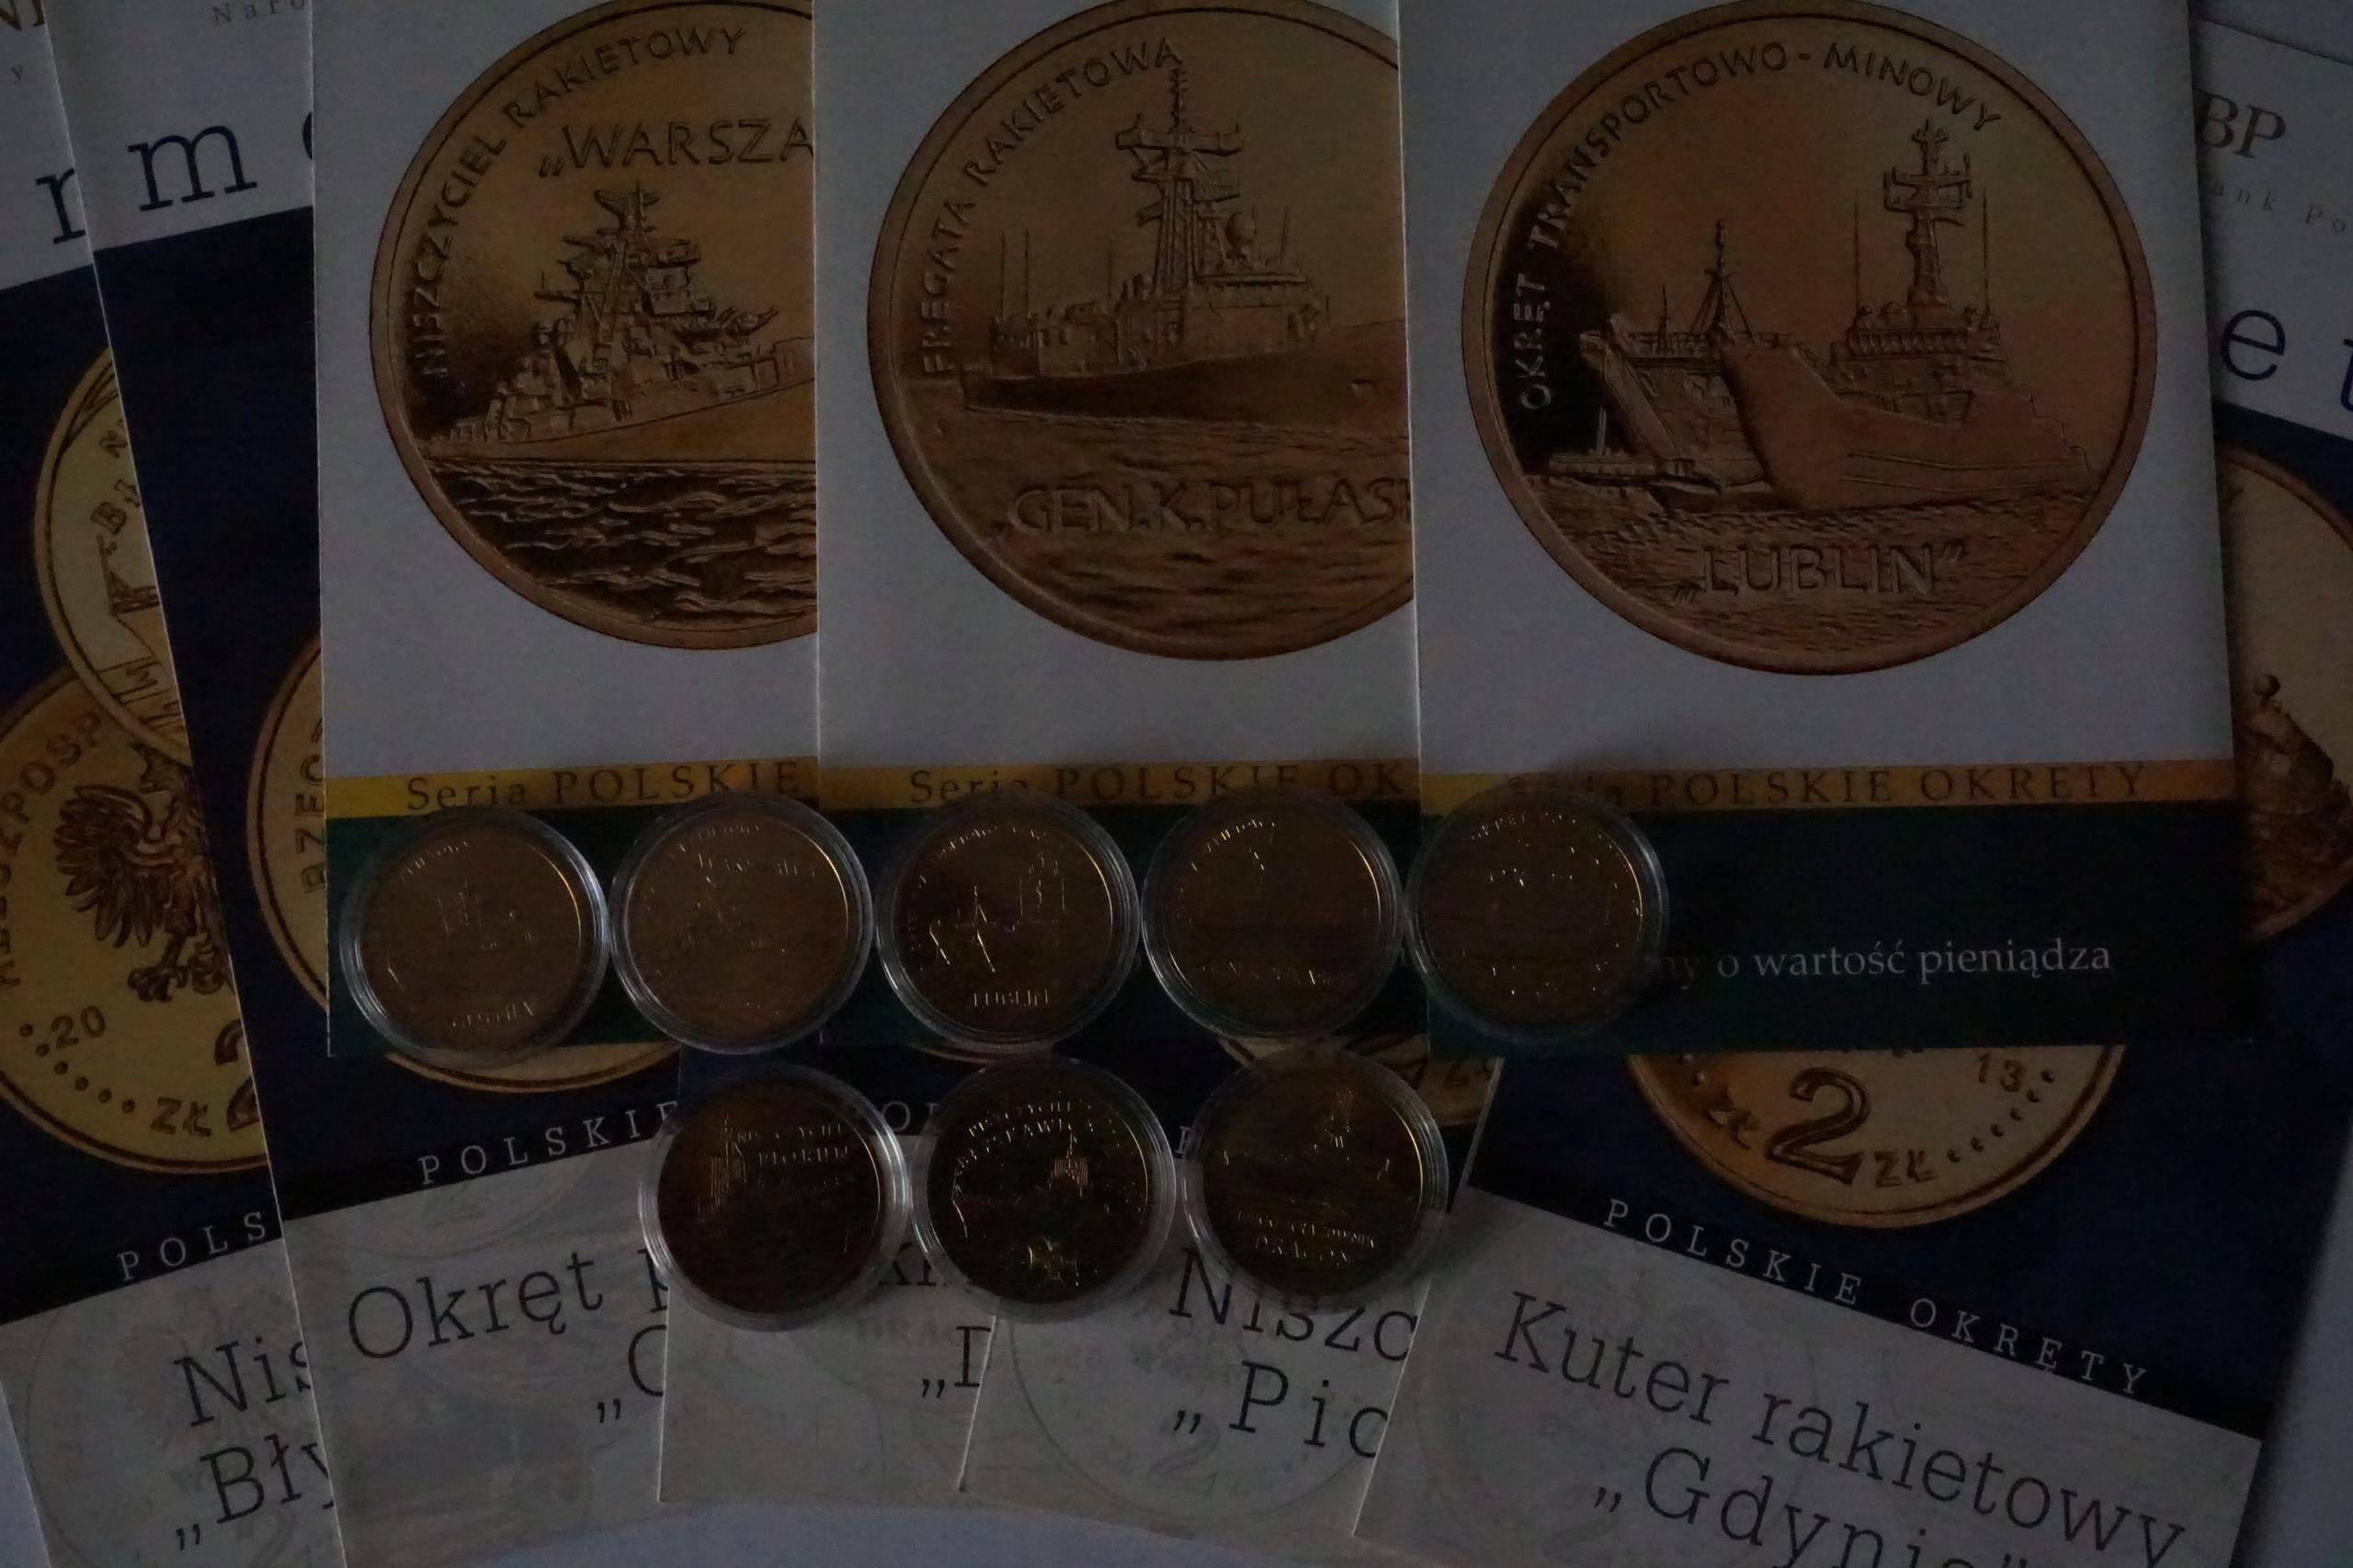 8 monet 2 zł Polskie Okręty kapsle ,foldery gratis